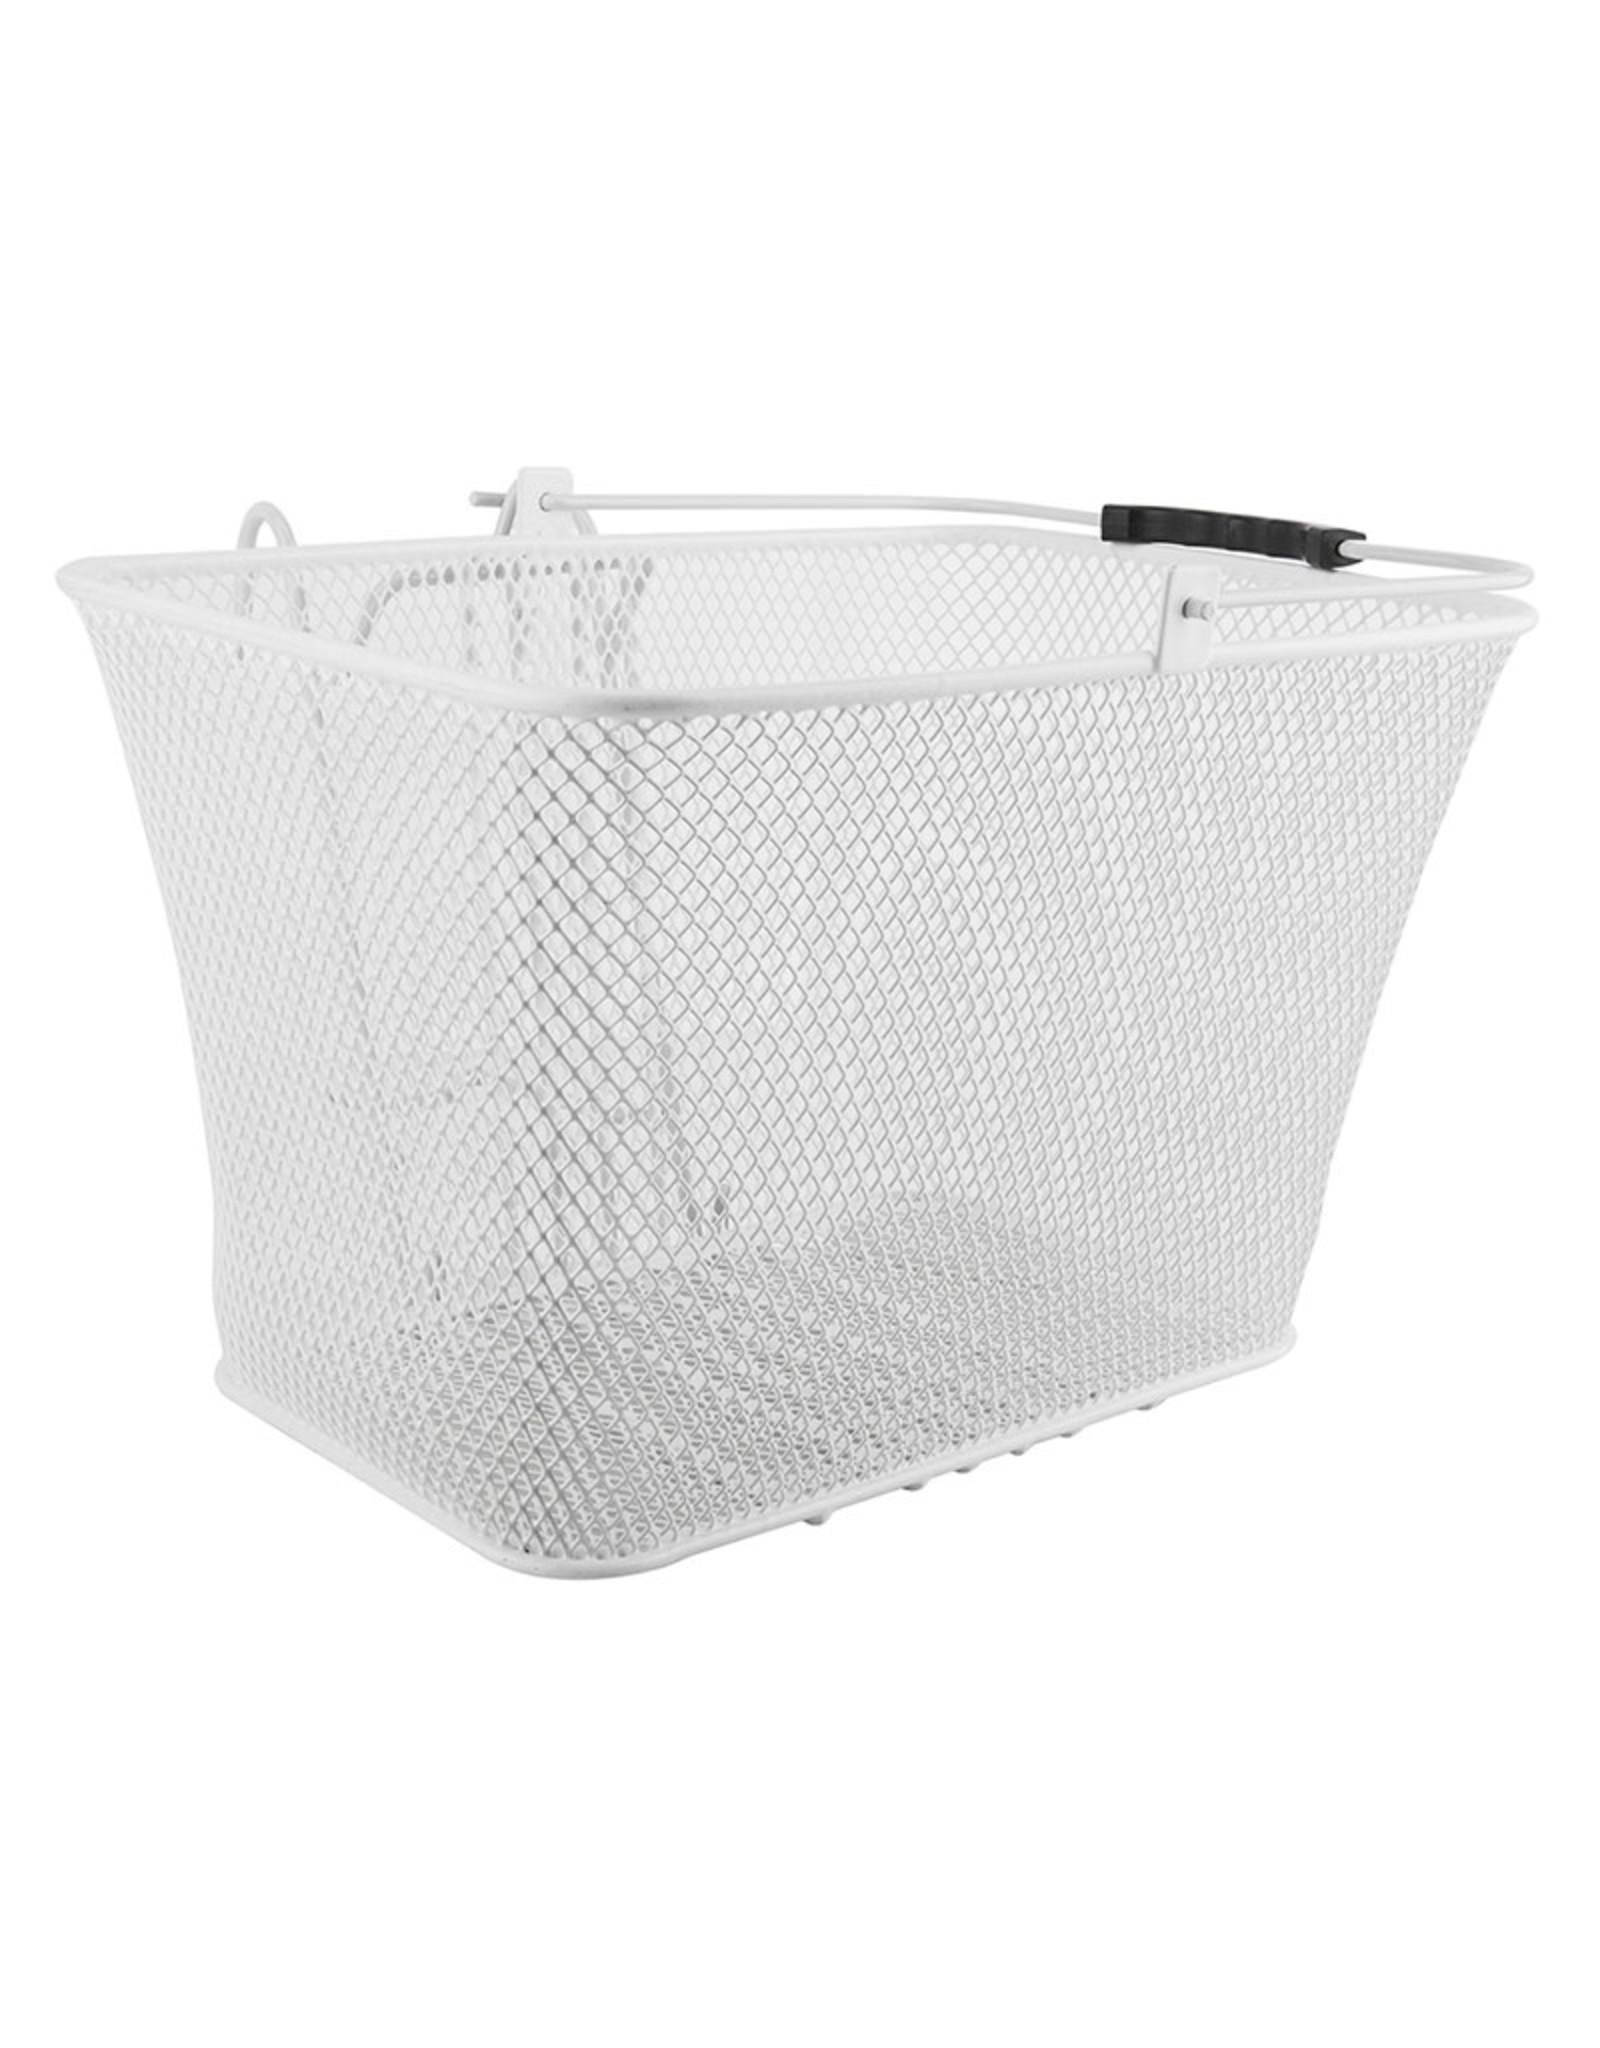 SUNLITE Sunlite Mesh  Lift Off Basket White, 14.5x8.5x7